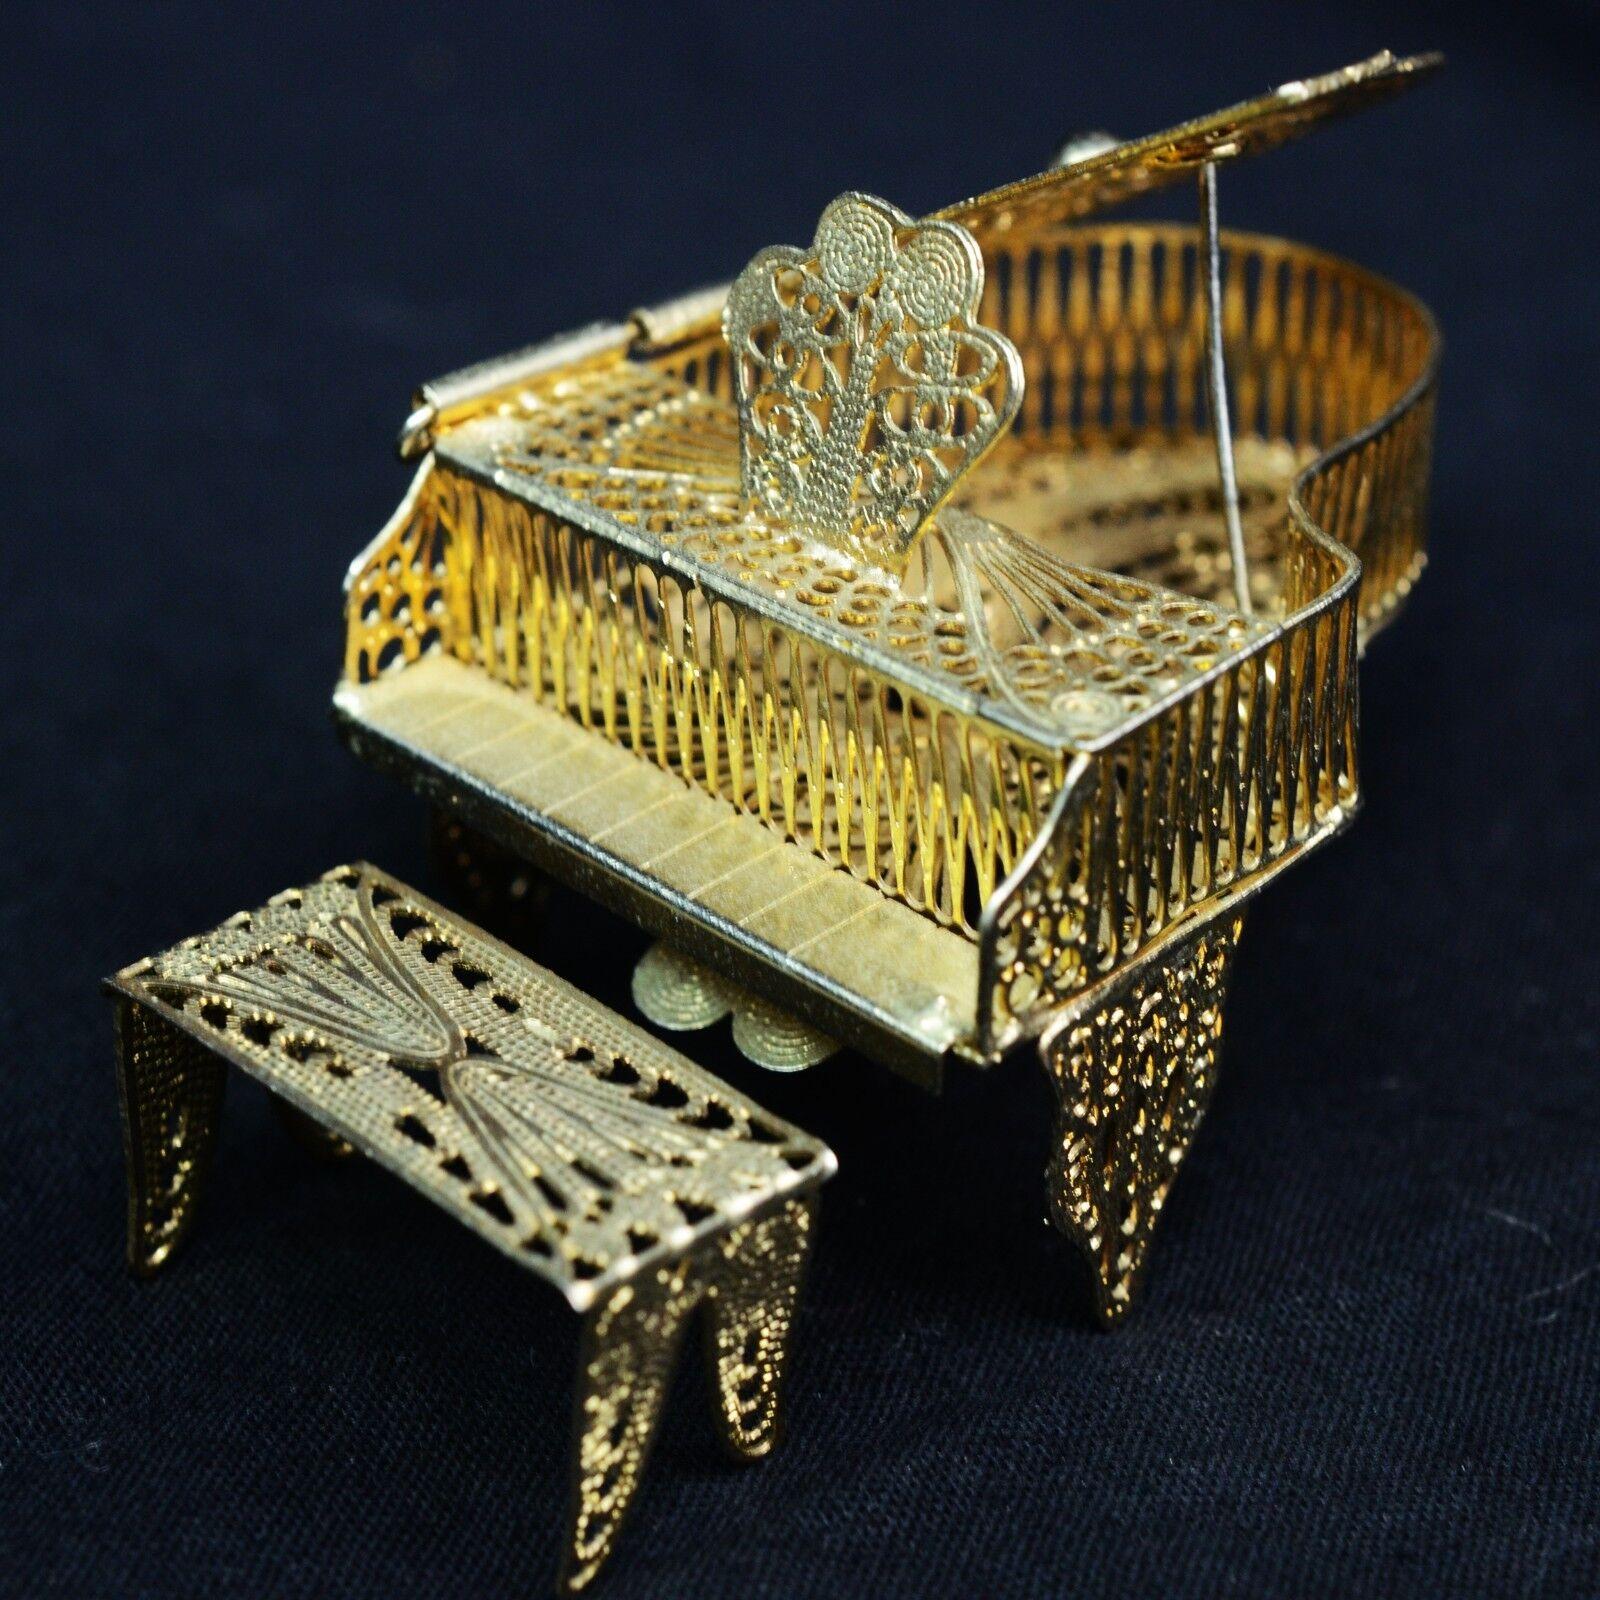 Vintage FILIGREE DOLLHOUSE PIANO, MINIATURE VERY ORNATE ORNATE ORNATE & BEAUTIFUL 3f3399